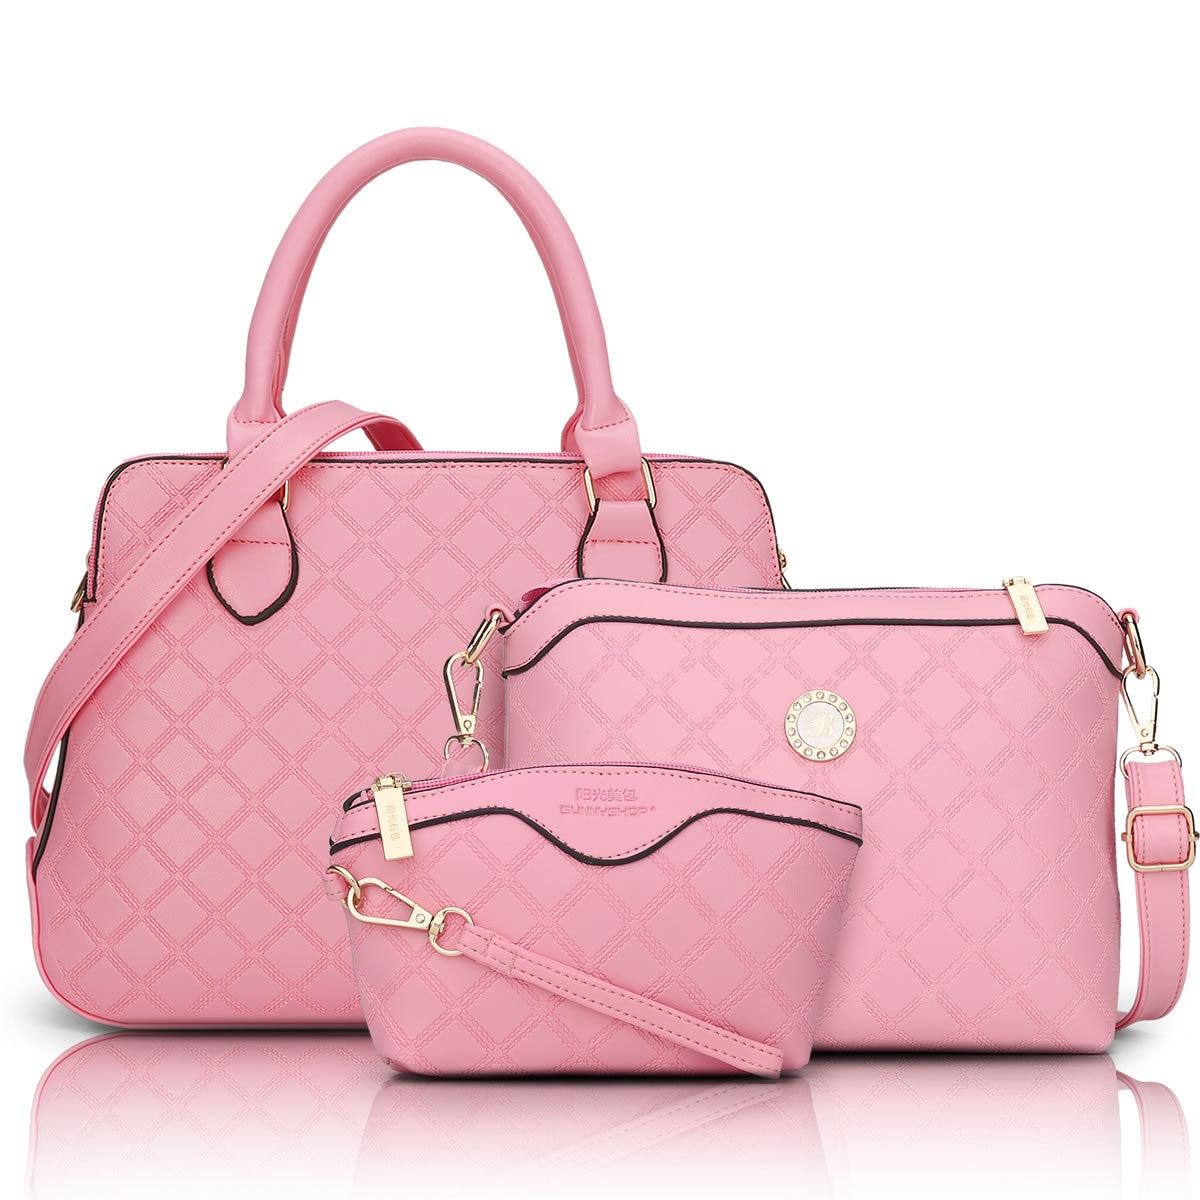 9eabe56da48d Fashion PU Patent Leather Women Shoulder Bags Elegant Alligator Pattern  Women Messenger Bags bolsos 2 bags set w  Bear Toy Q5 USD 57.6 piece. 3 Bag Set  New ...